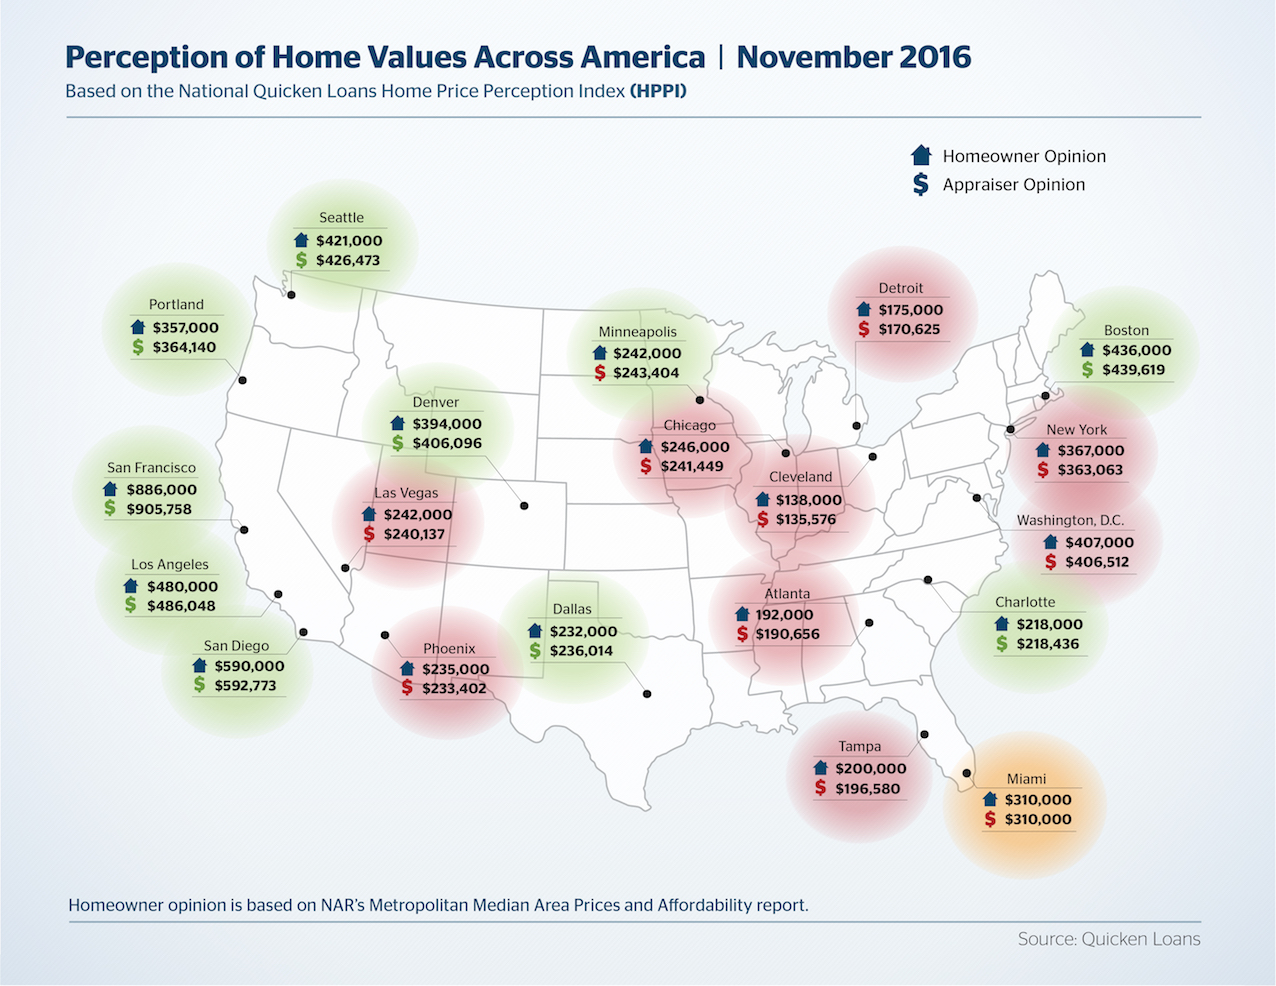 HPPI - Home Values Across America